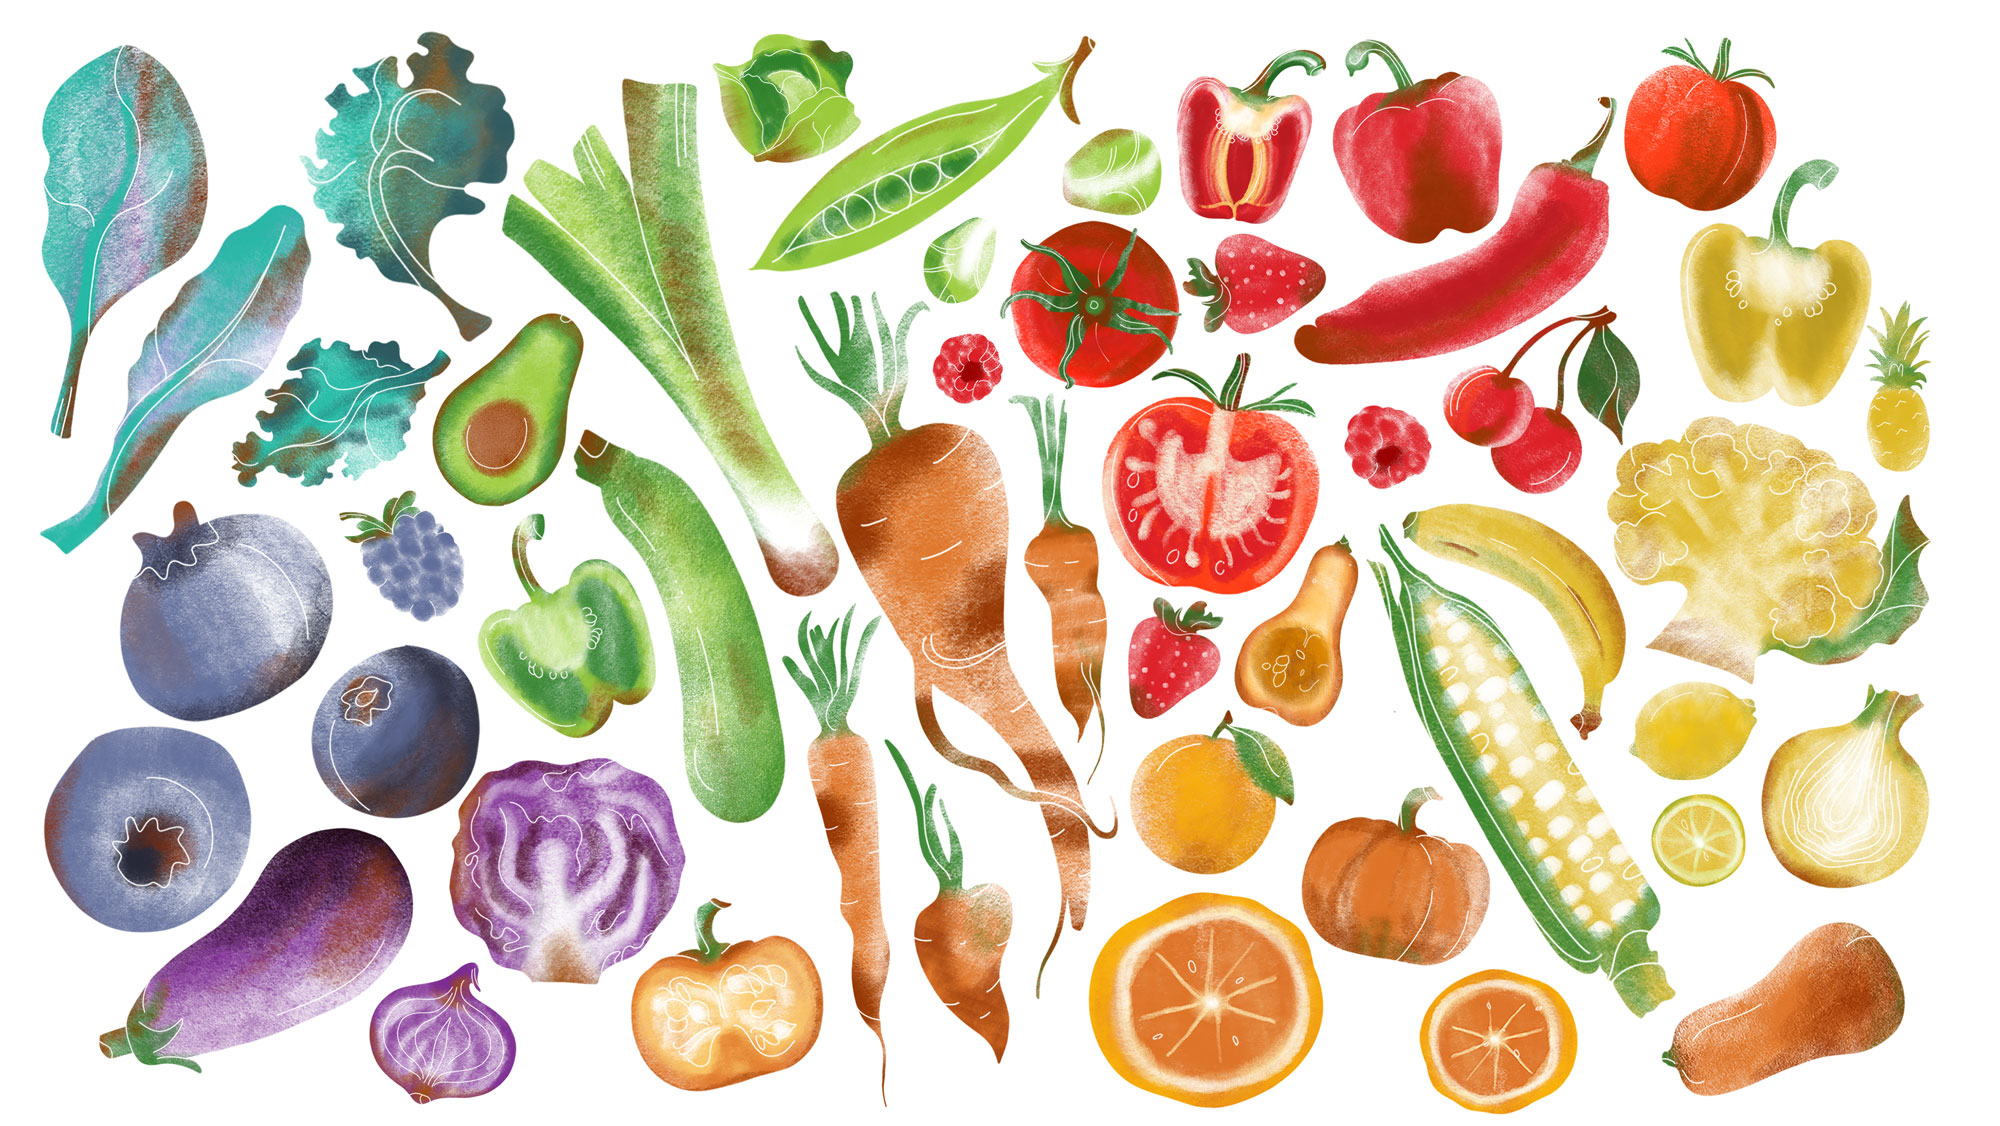 Illustration worksheet of fruit and veg